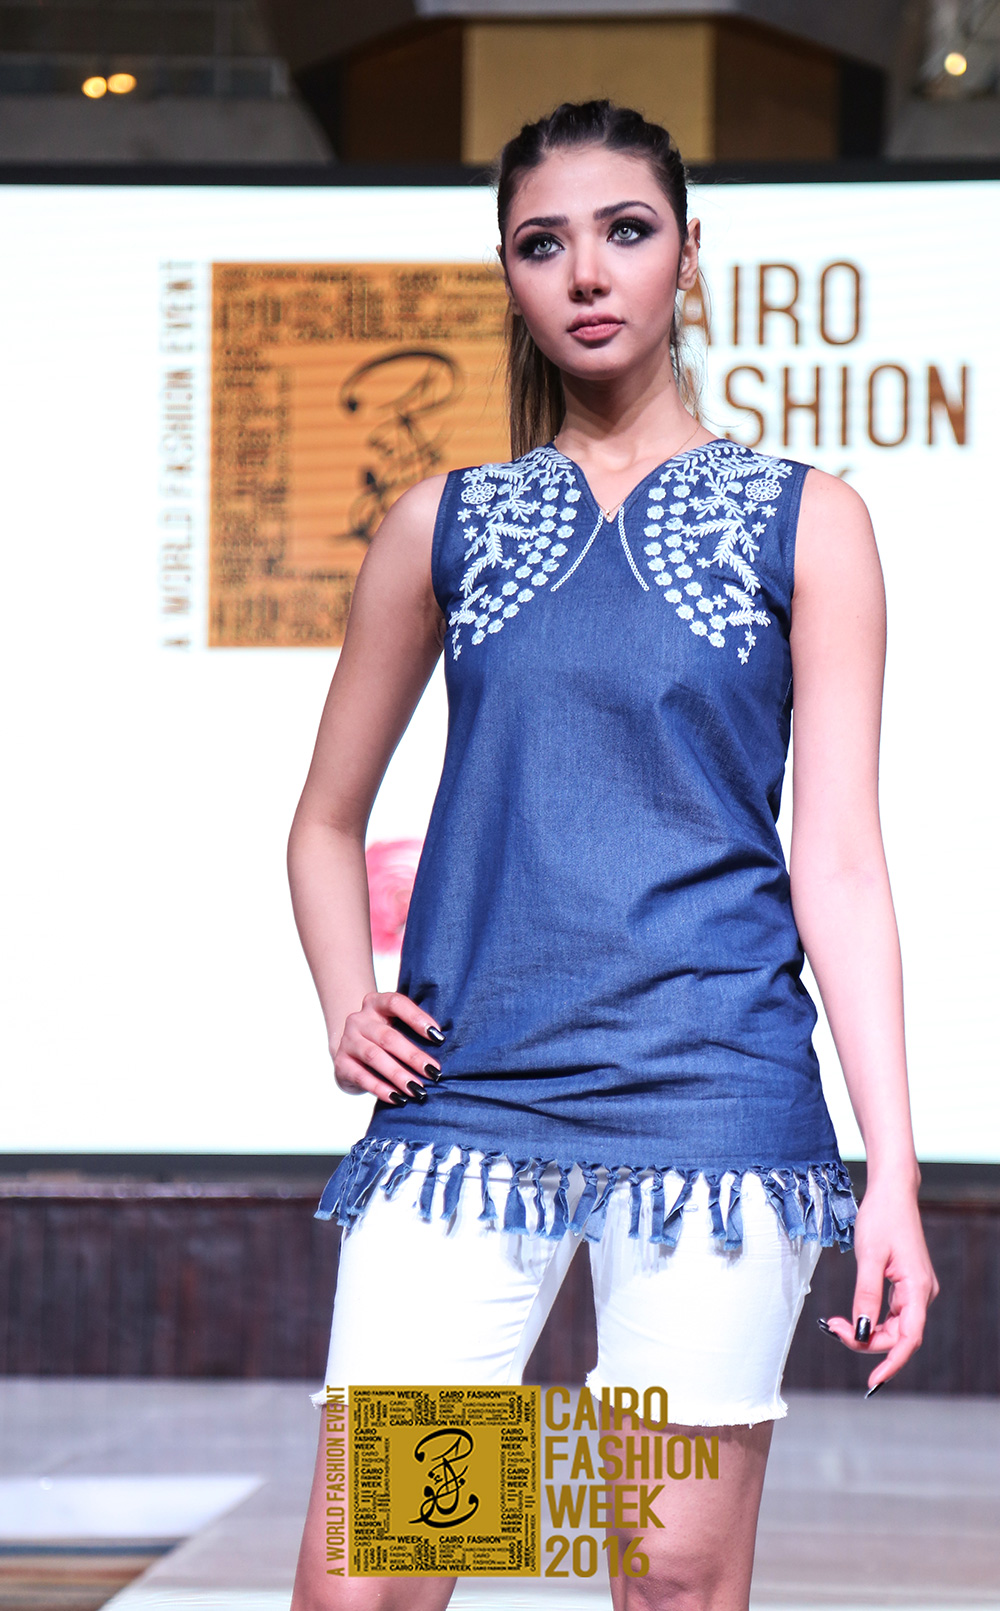 gallery international fashion trade show